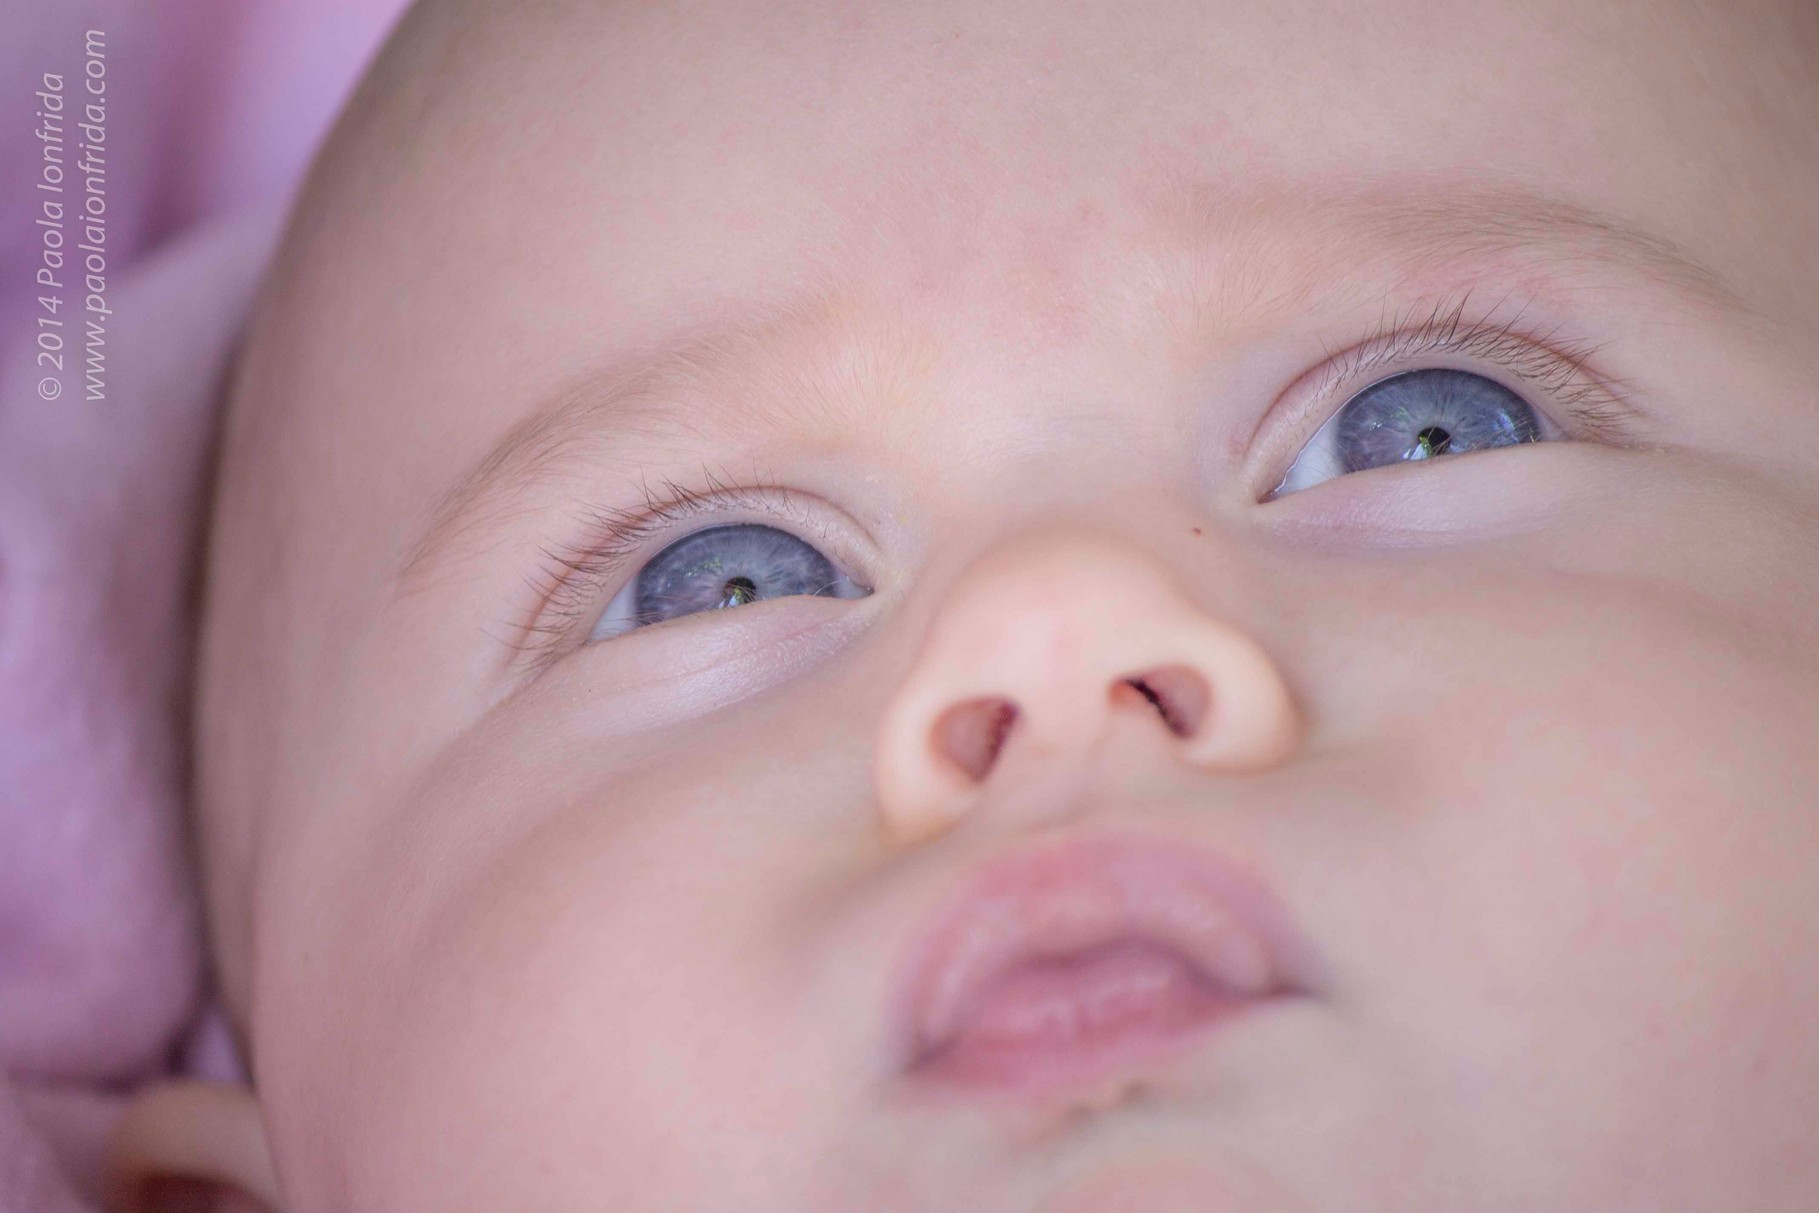 Occhi celesti